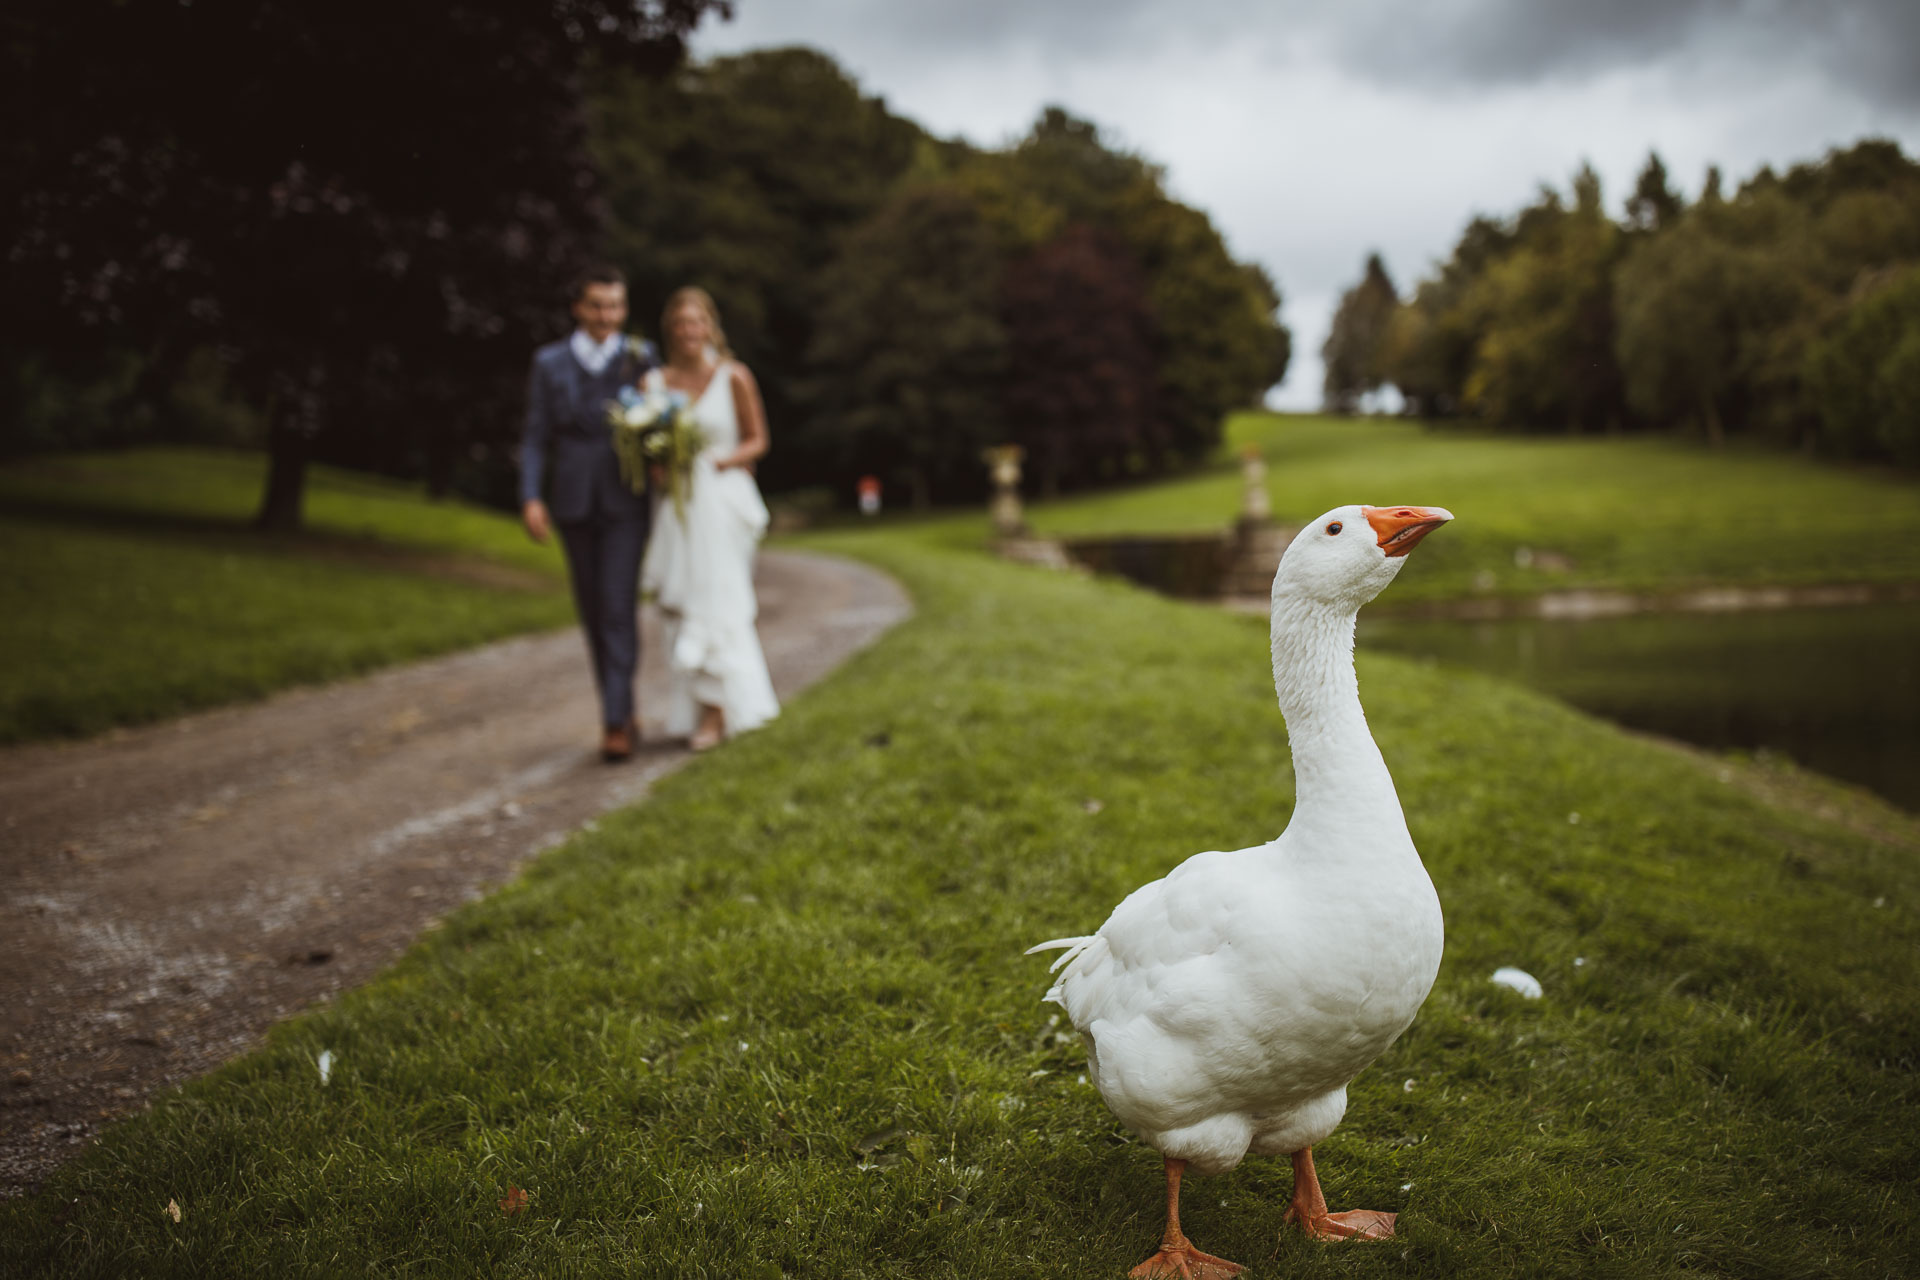 forbidden_corner_tupgill_estate_wedding_photographer-102.jpg